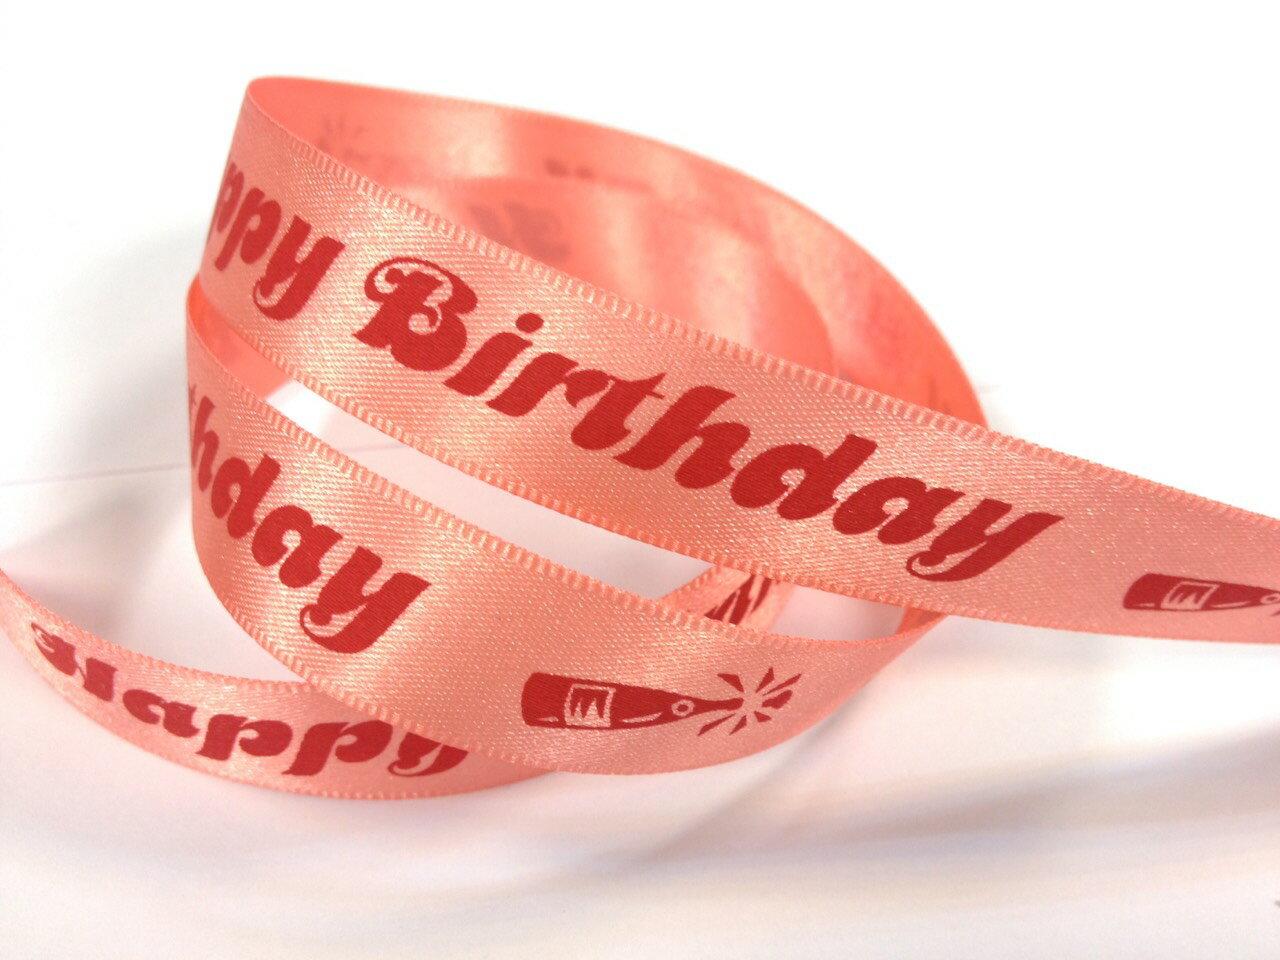 【Crystal Rose緞帶專賣店】雙面緞生日快樂-汽水瓶 0